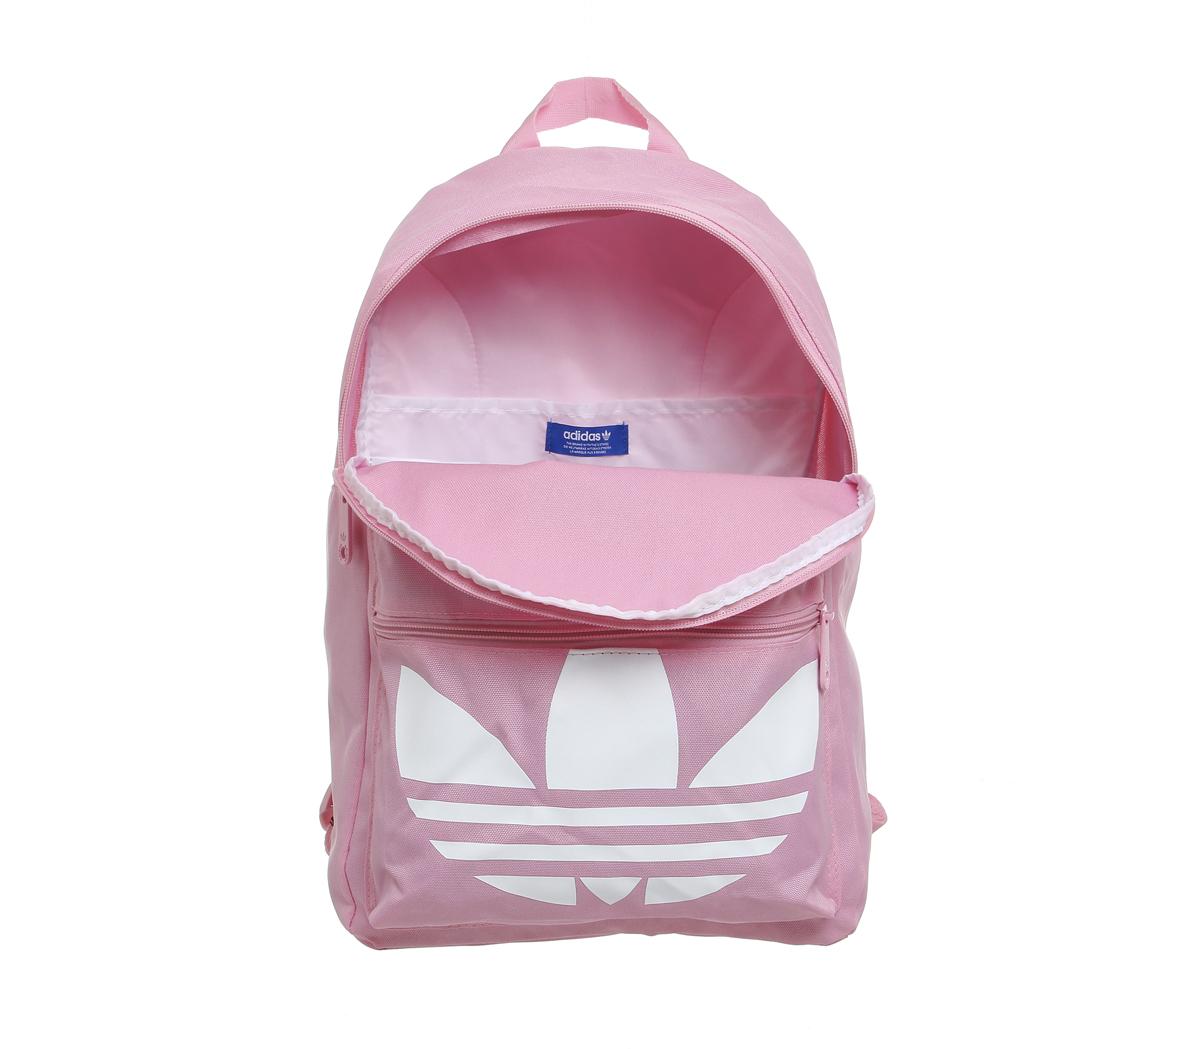 81da78257c05 Lyst - adidas Originals Trefoil Canvas Backpack in Pink